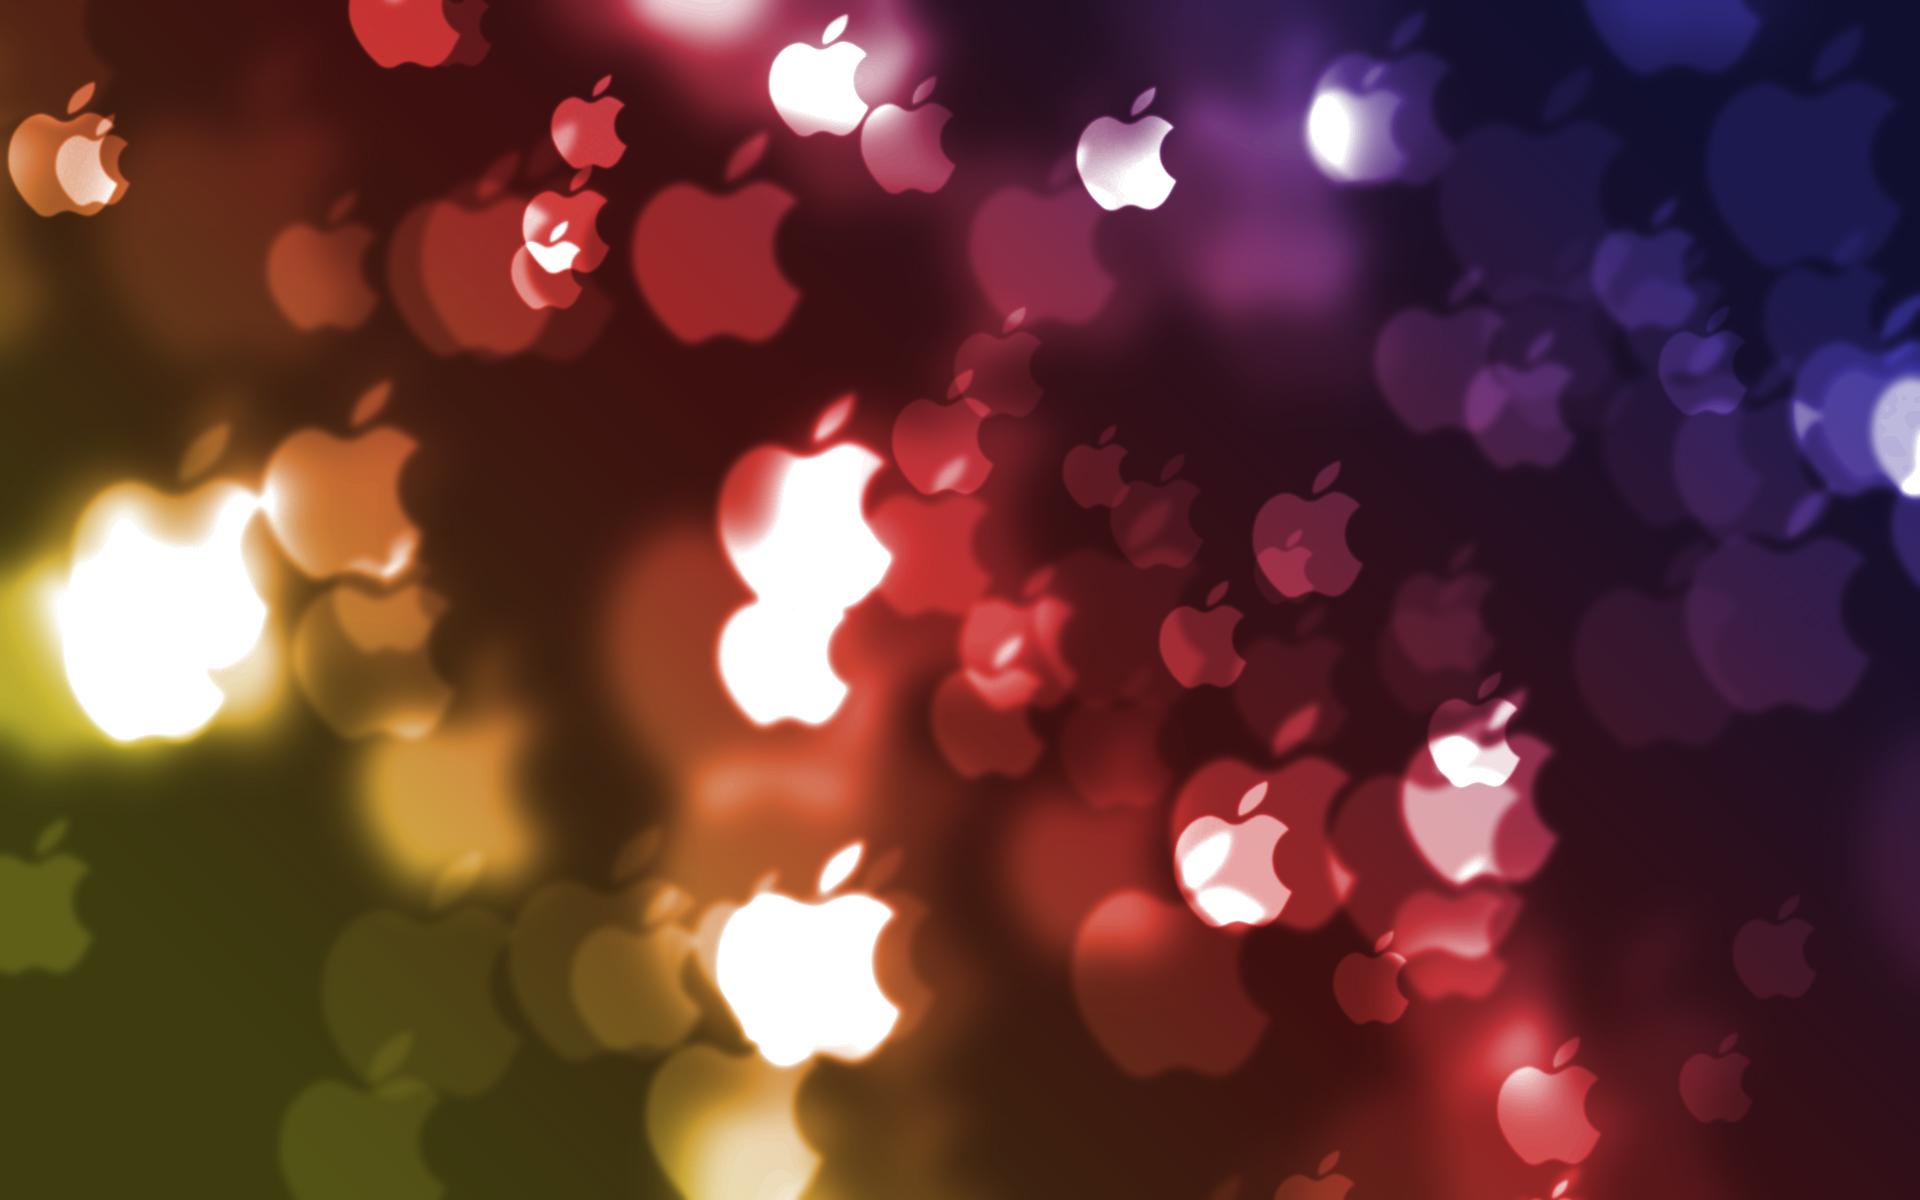 Apple Invasion by enricoagostoni